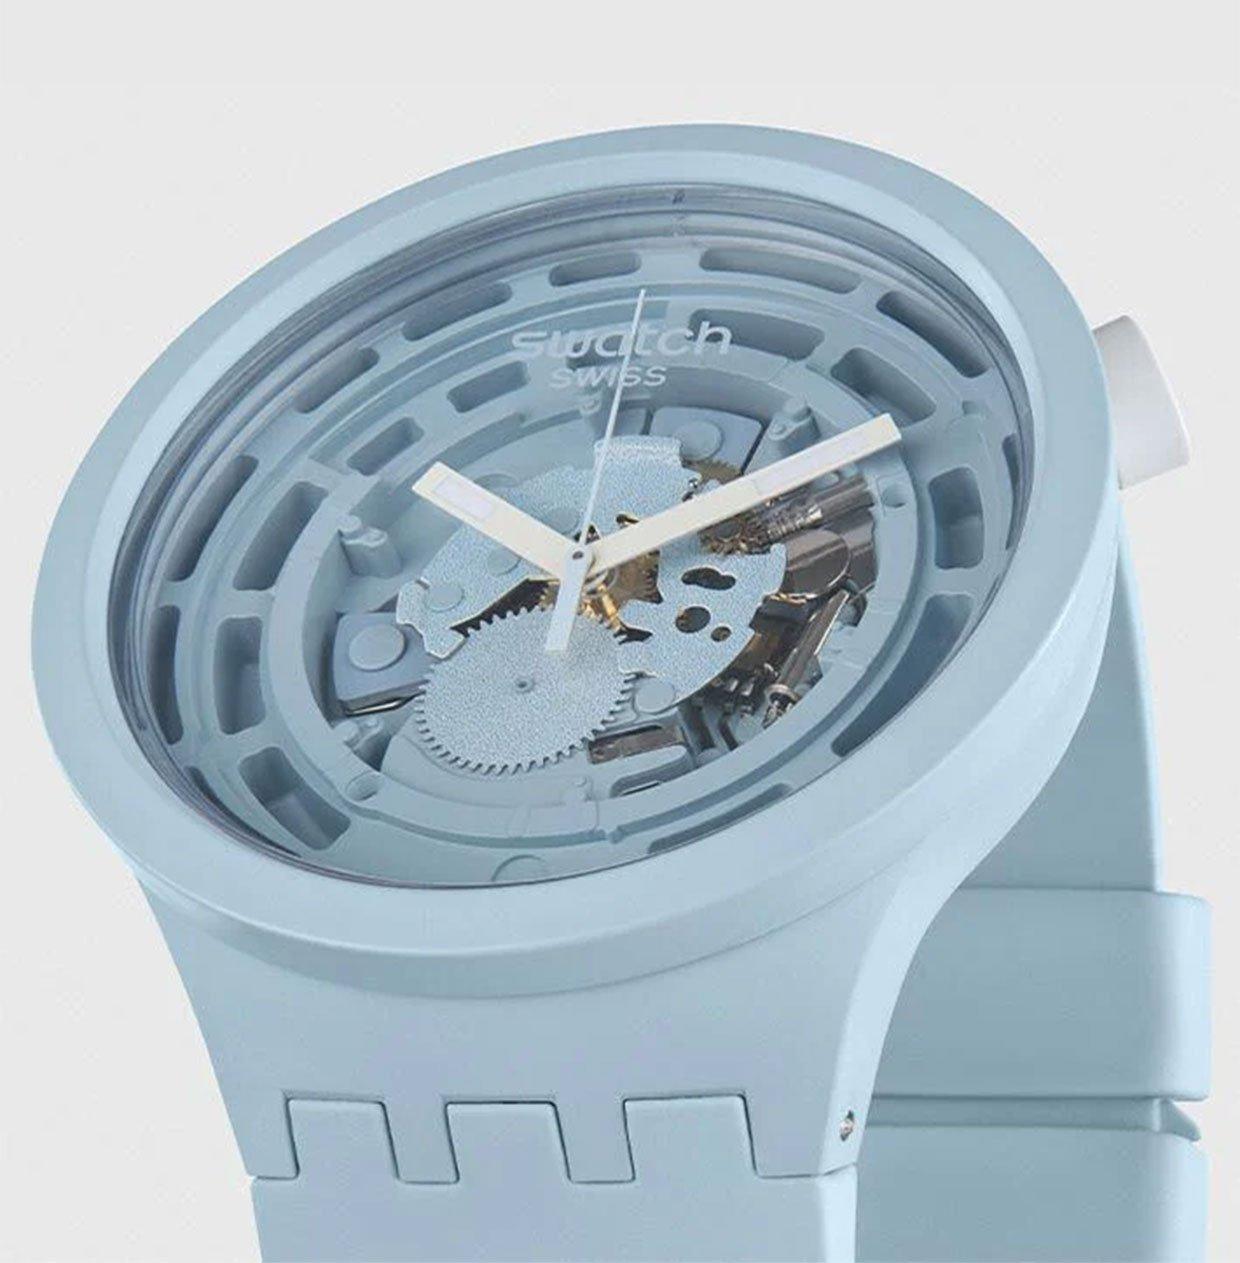 Swatch Bio-Ceramic Watches